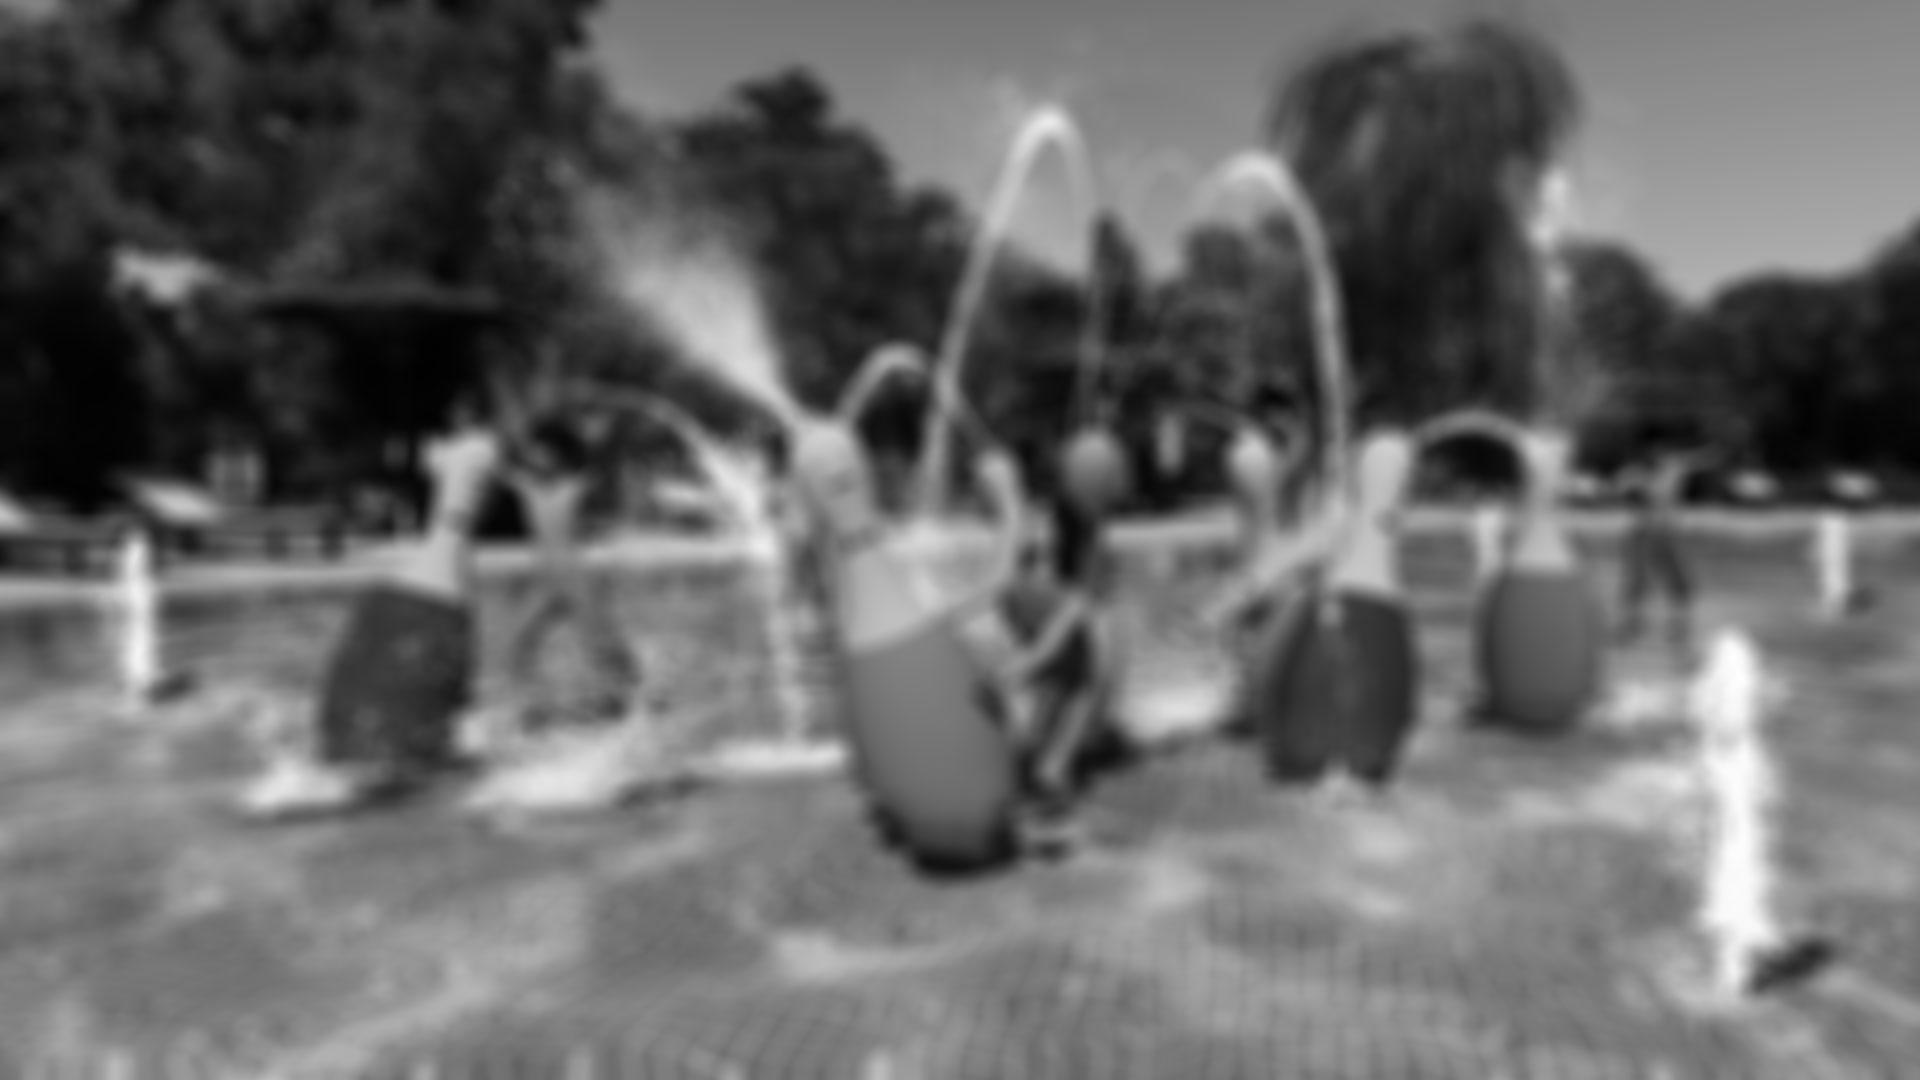 waterbowling_bw-1.jpg